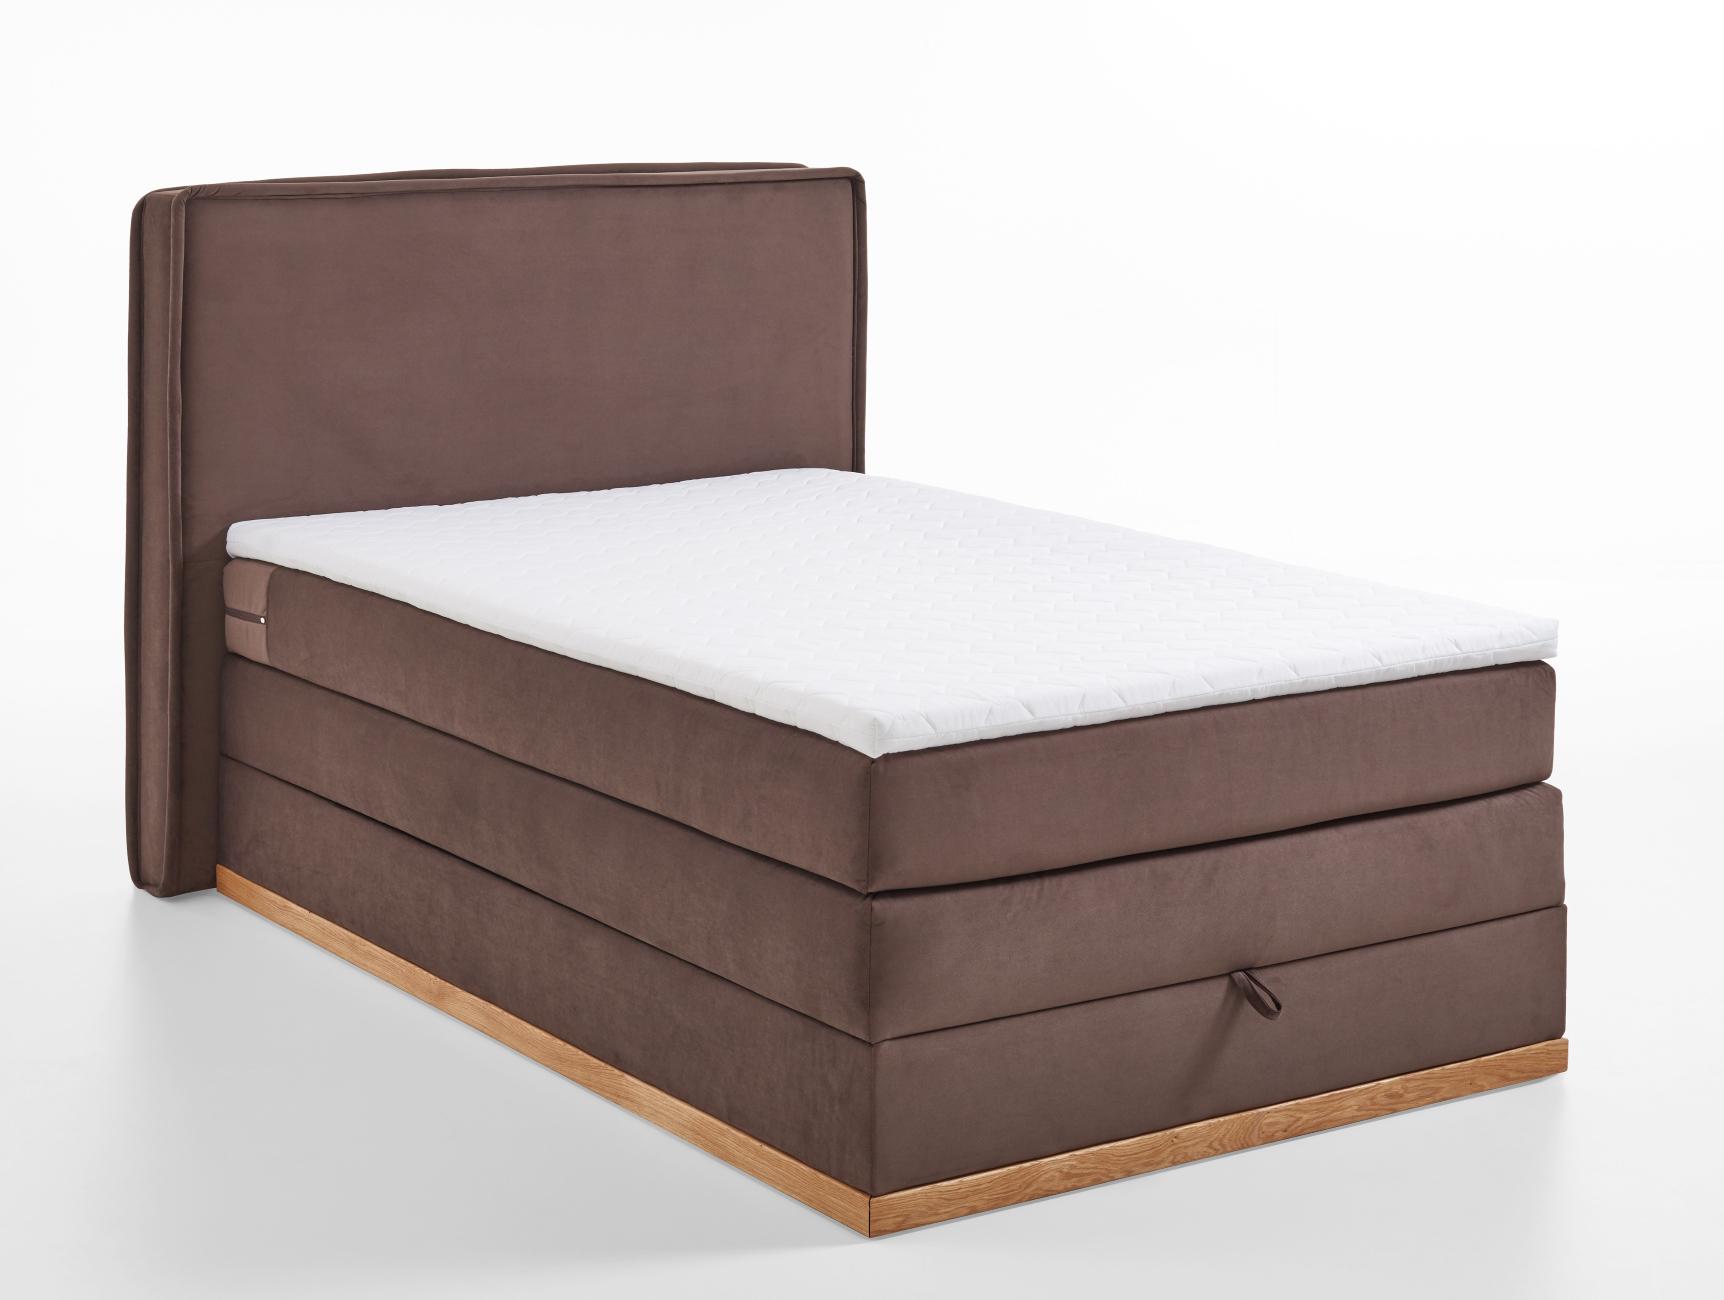 Boxspringbett Nr.1901 180x200 mit Bettkasten